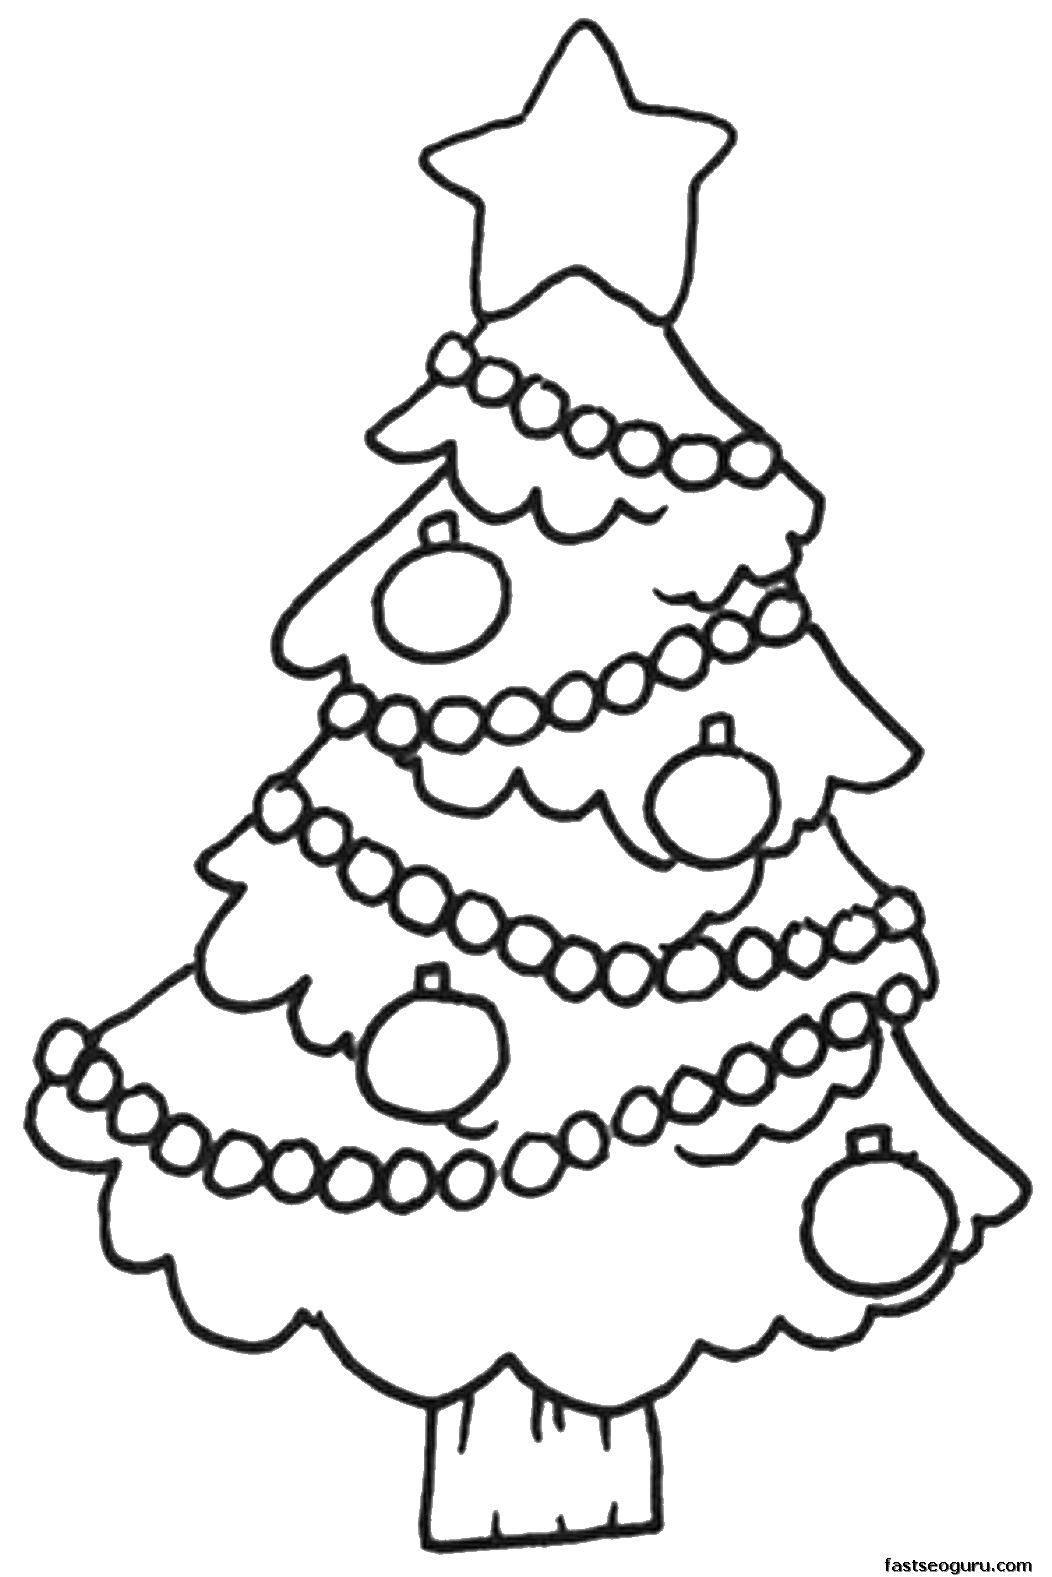 Coloring Herringbone Download ,Christmas, Christmas toy, Christmas tree, gifts,.  Print